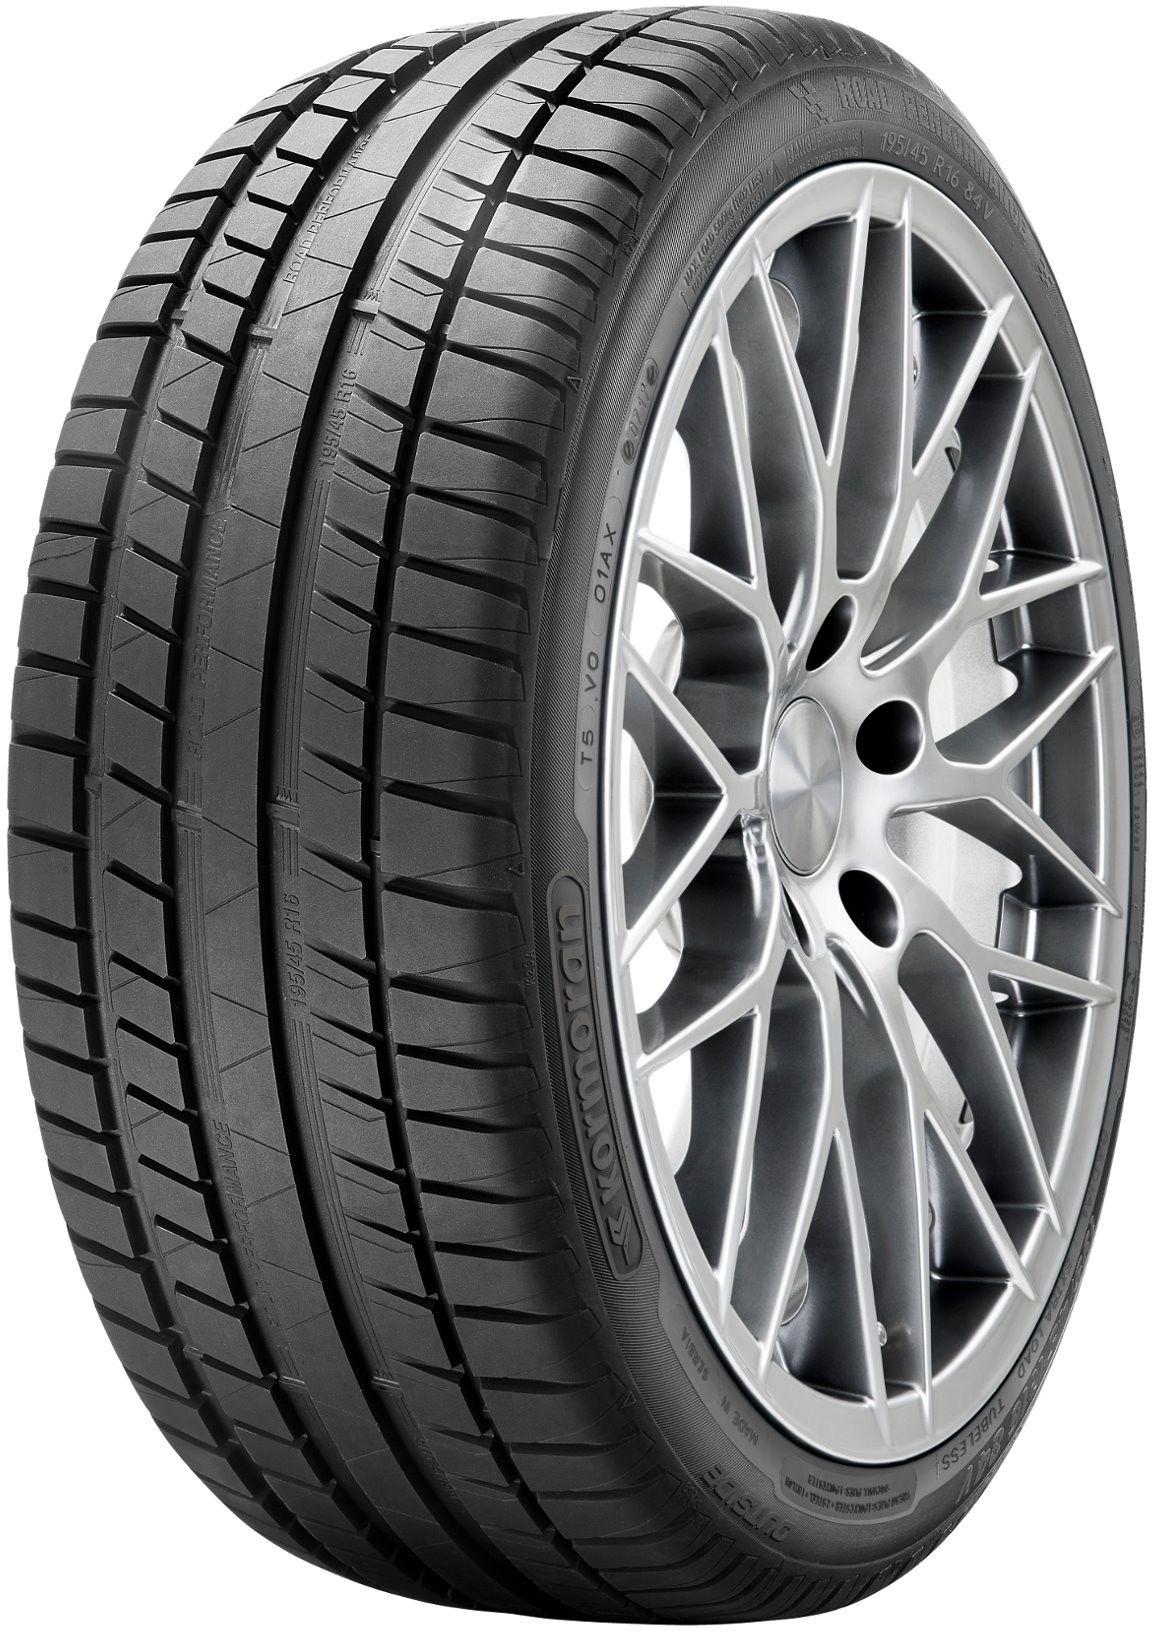 Kormoran Road Performance 185/60R15 84 H